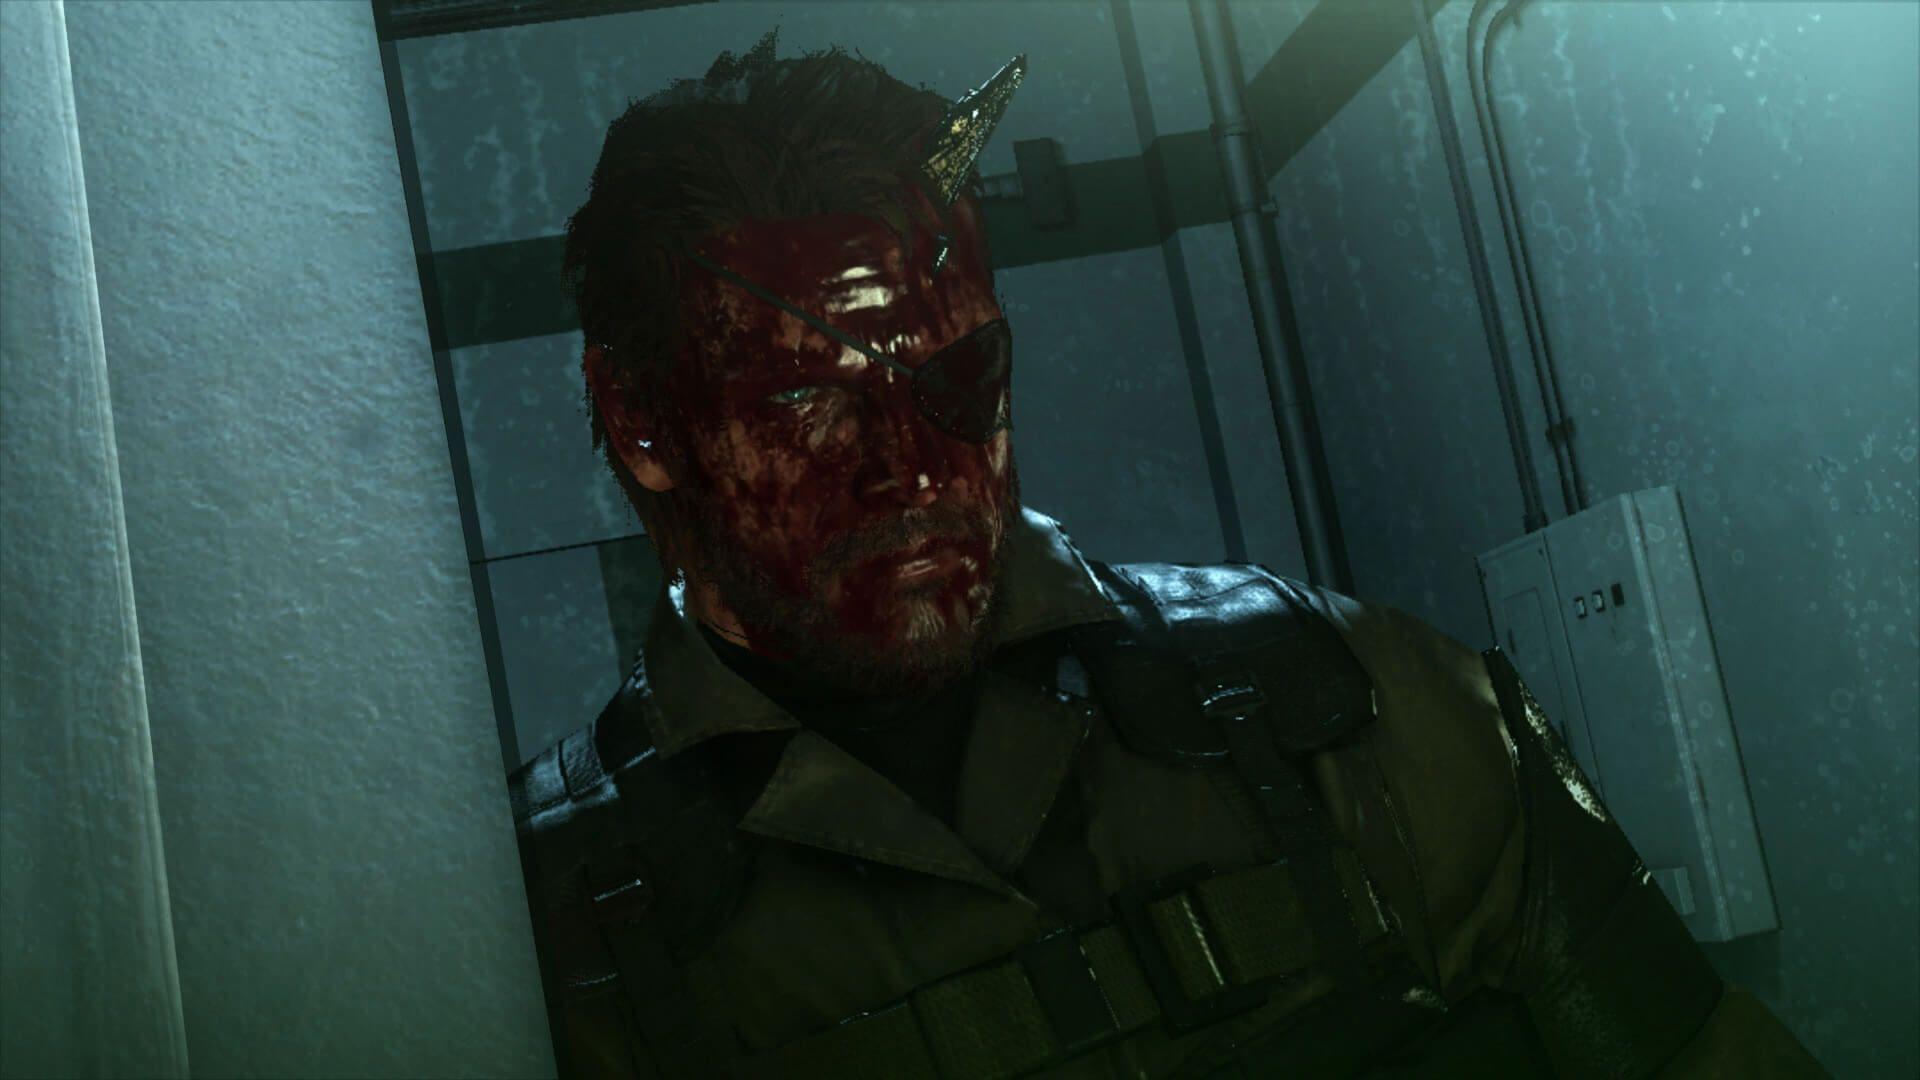 Metal-Gear-Solid-5-Phantom-Pain-Big-Boss.jpg.optimal